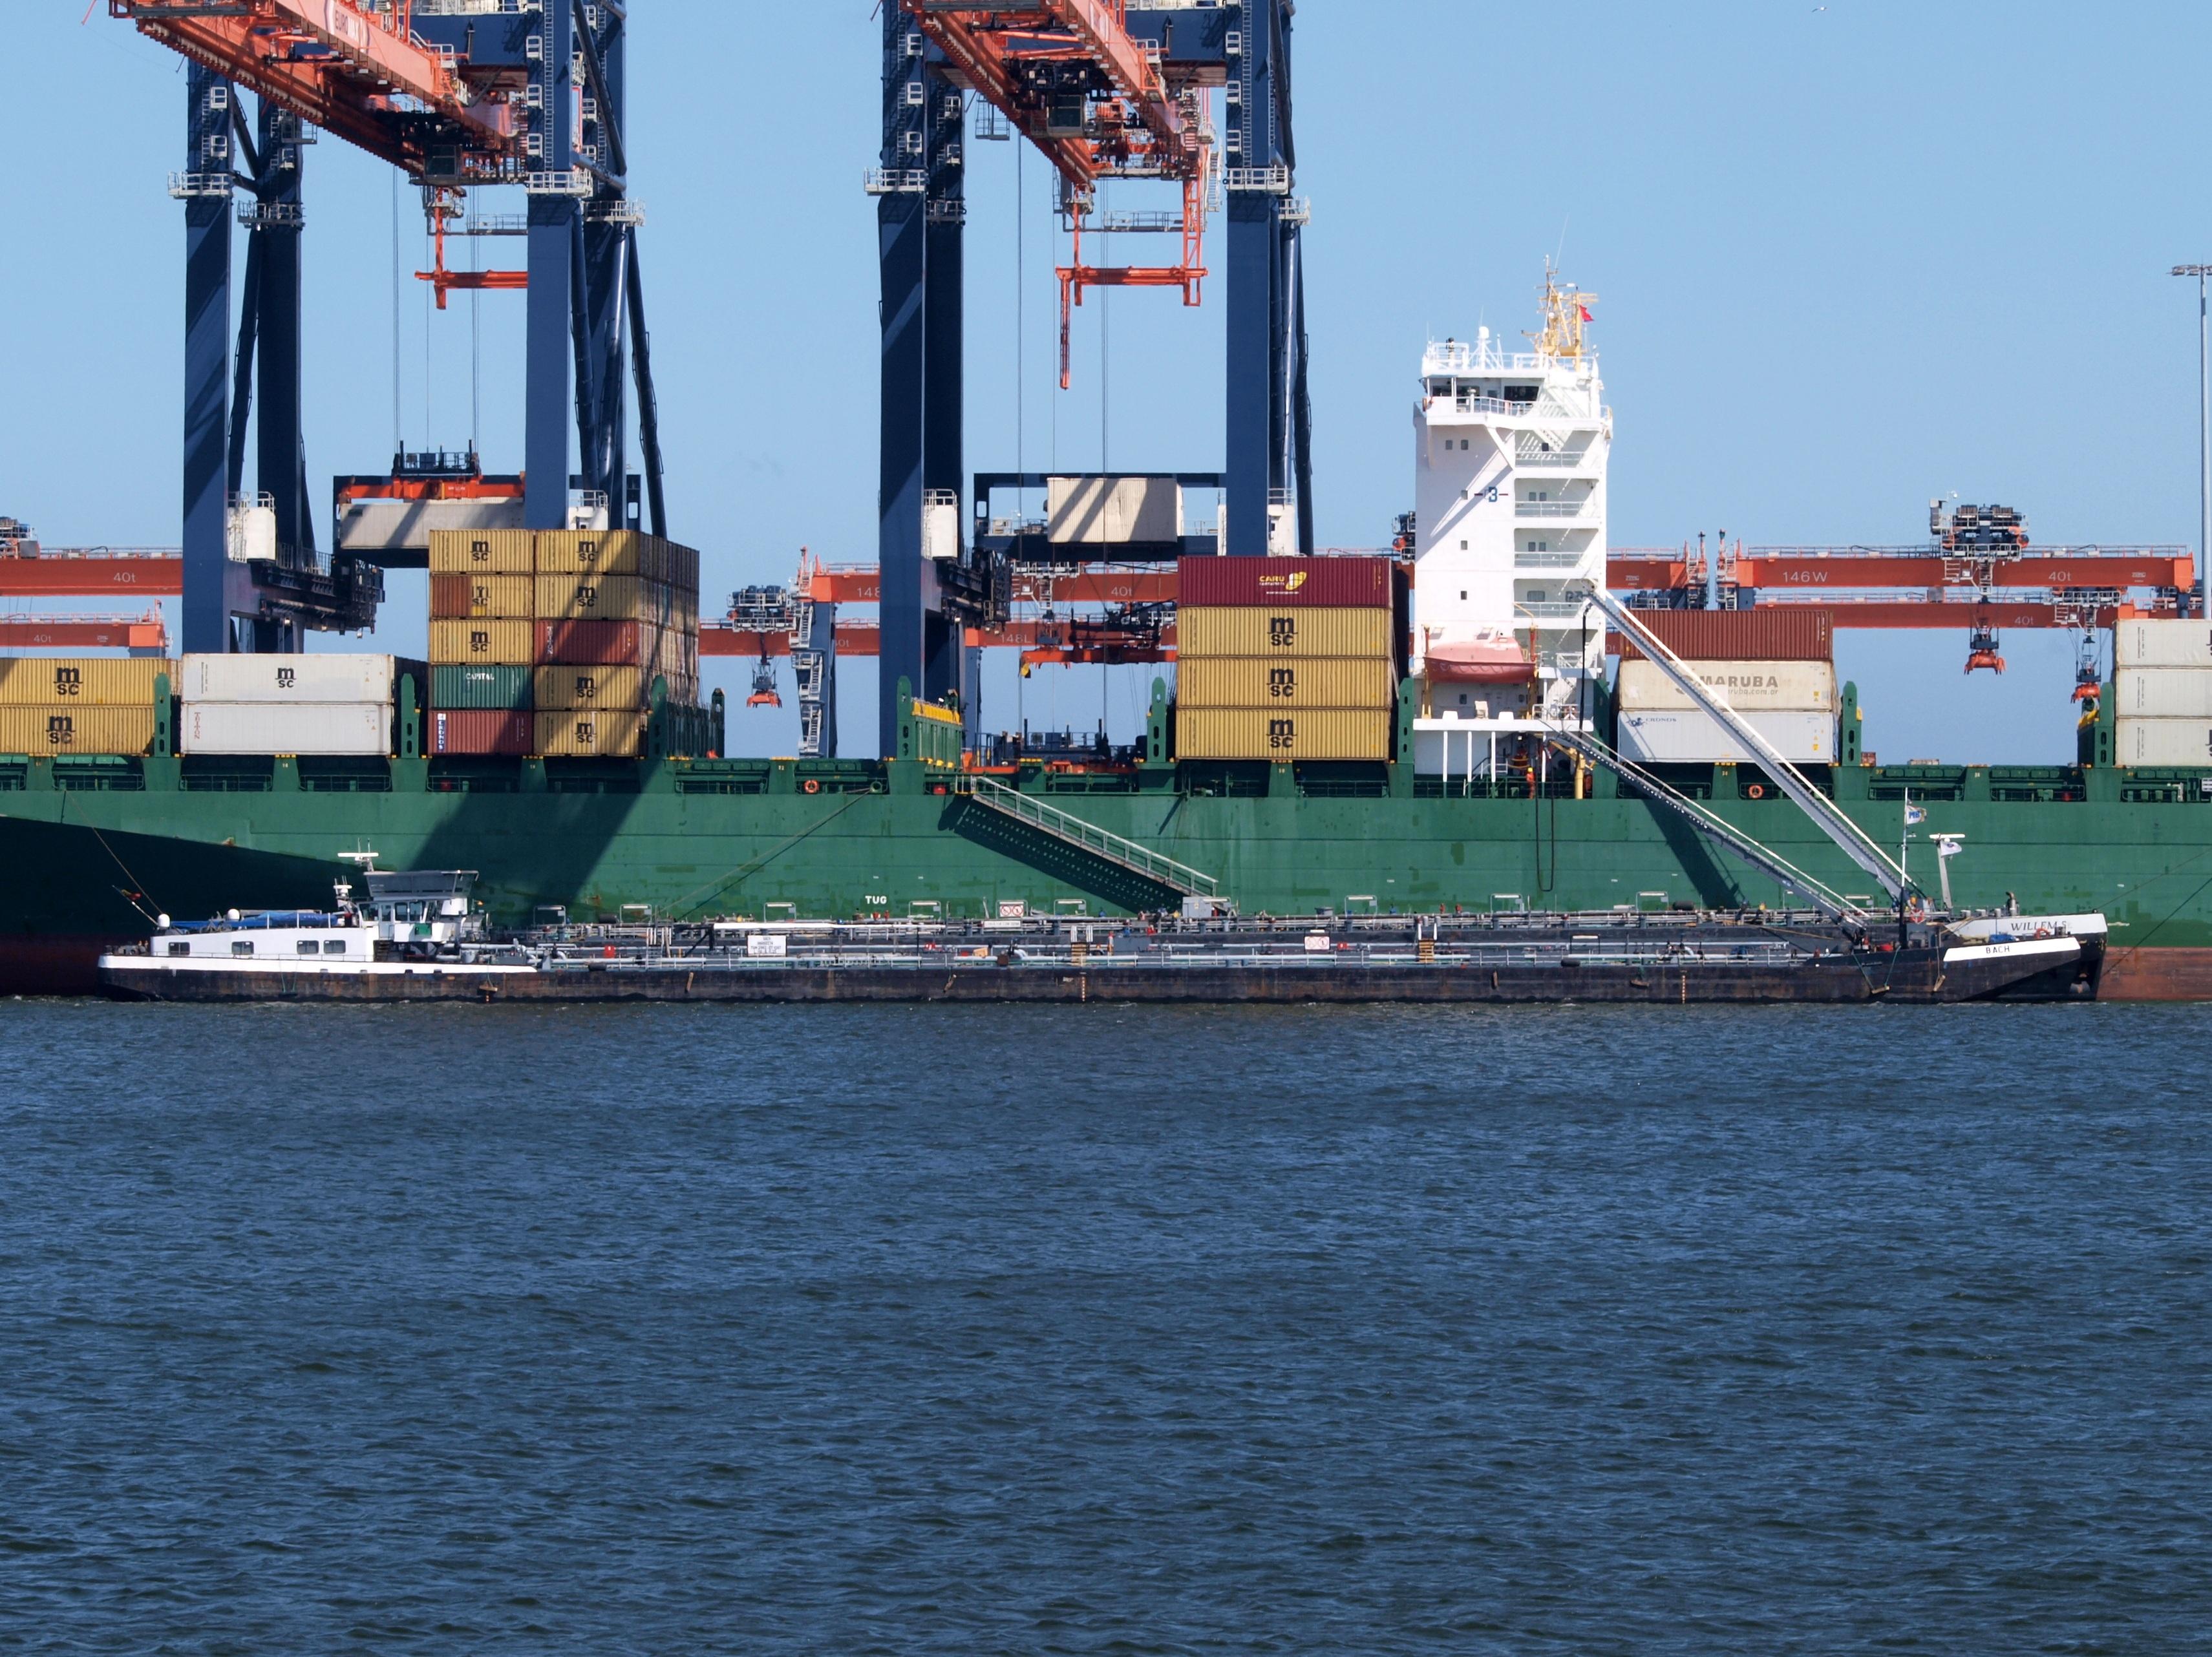 Free Images : sea, ocean, dock, boat, vessel, vehicle, mast